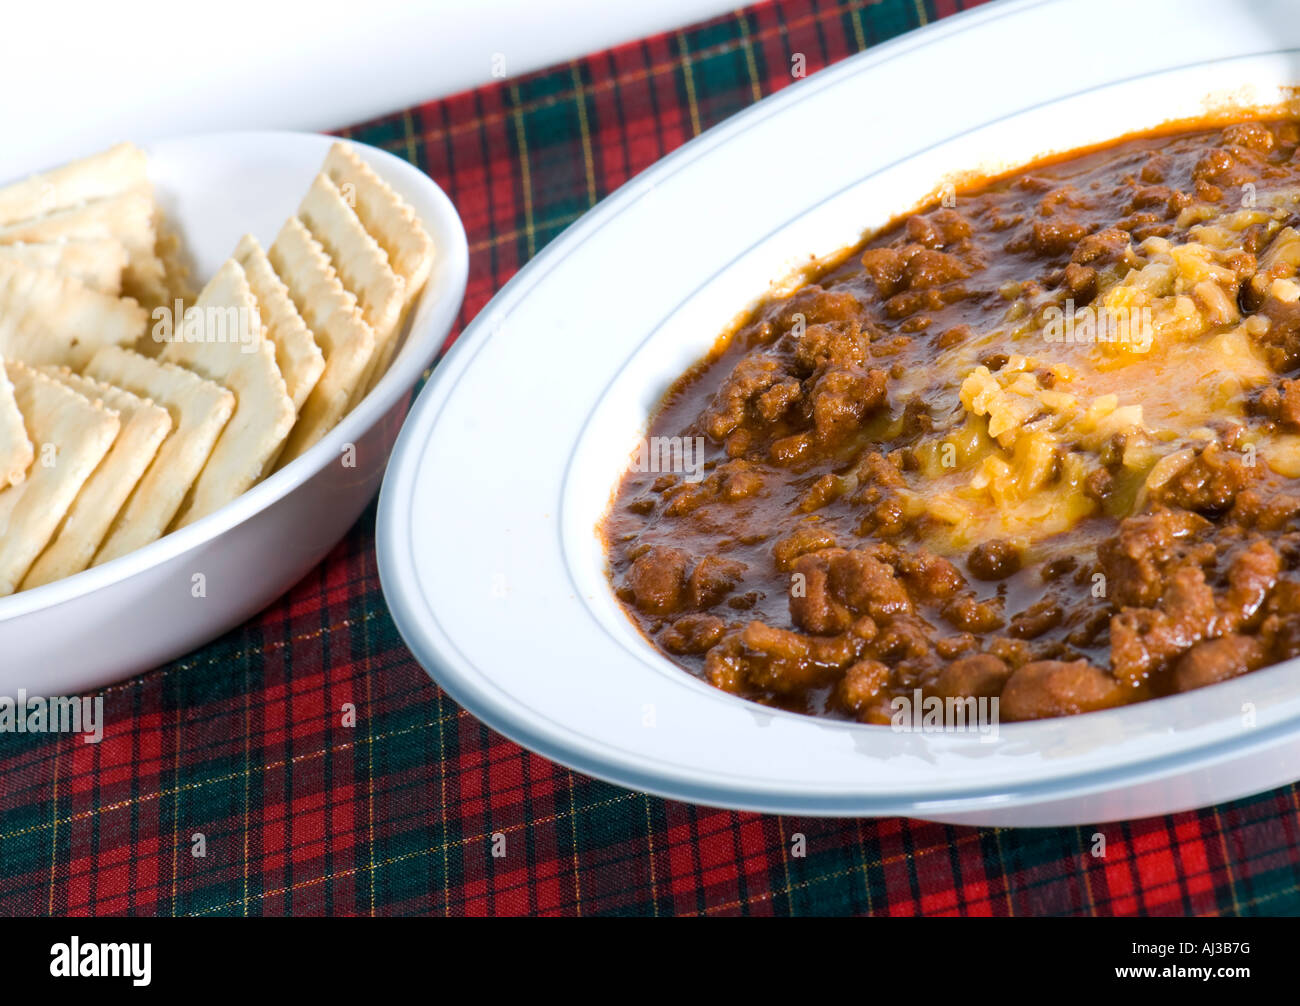 A Bowl Of Chili With Saltines Oklahoma Usa Stock Photo Alamy